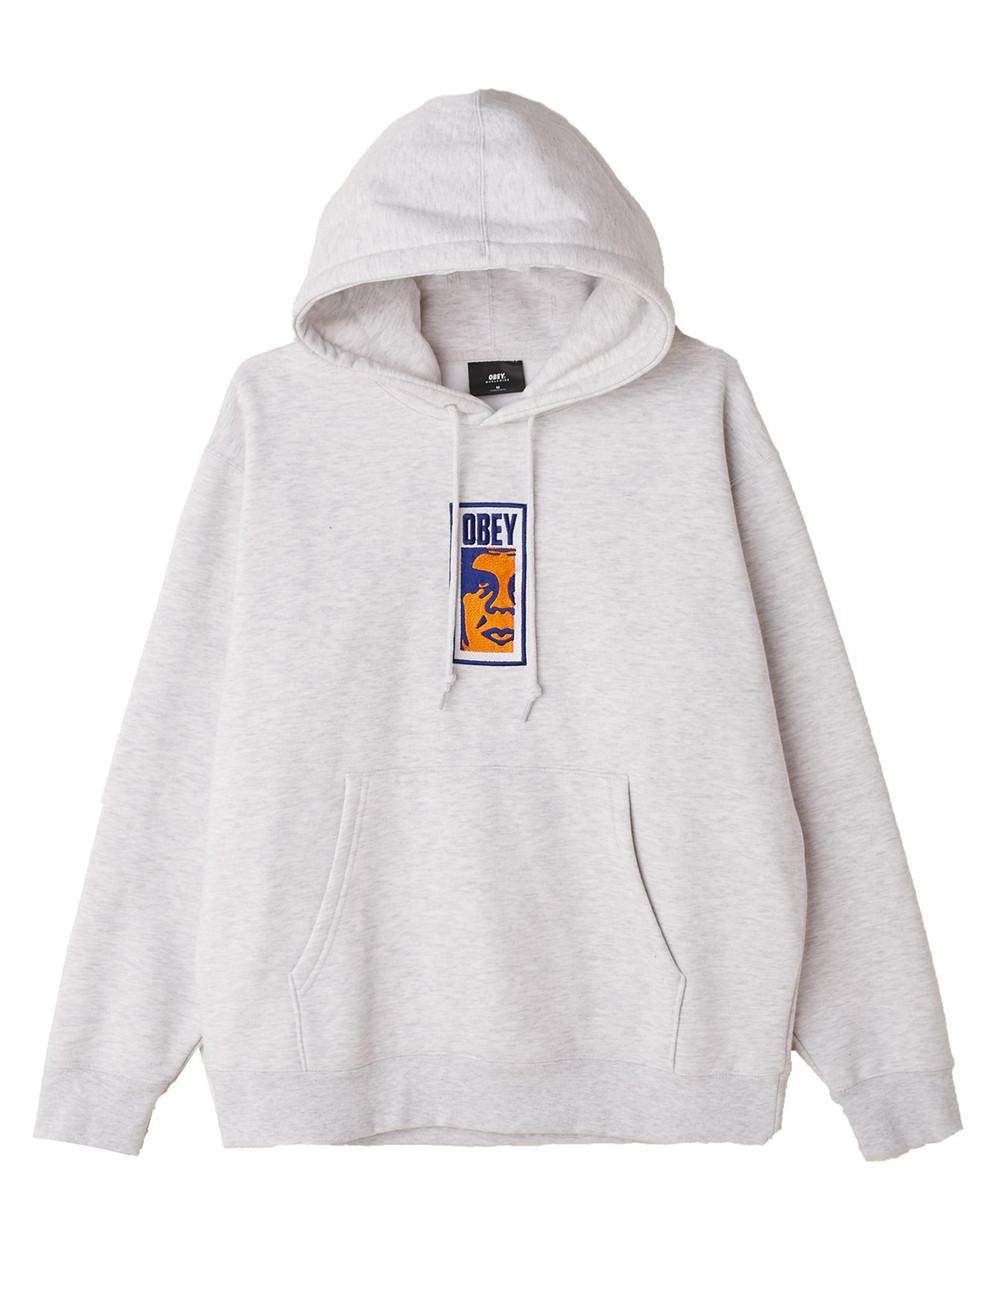 Obey Slim icon hood - 112470069   Shapestore.it